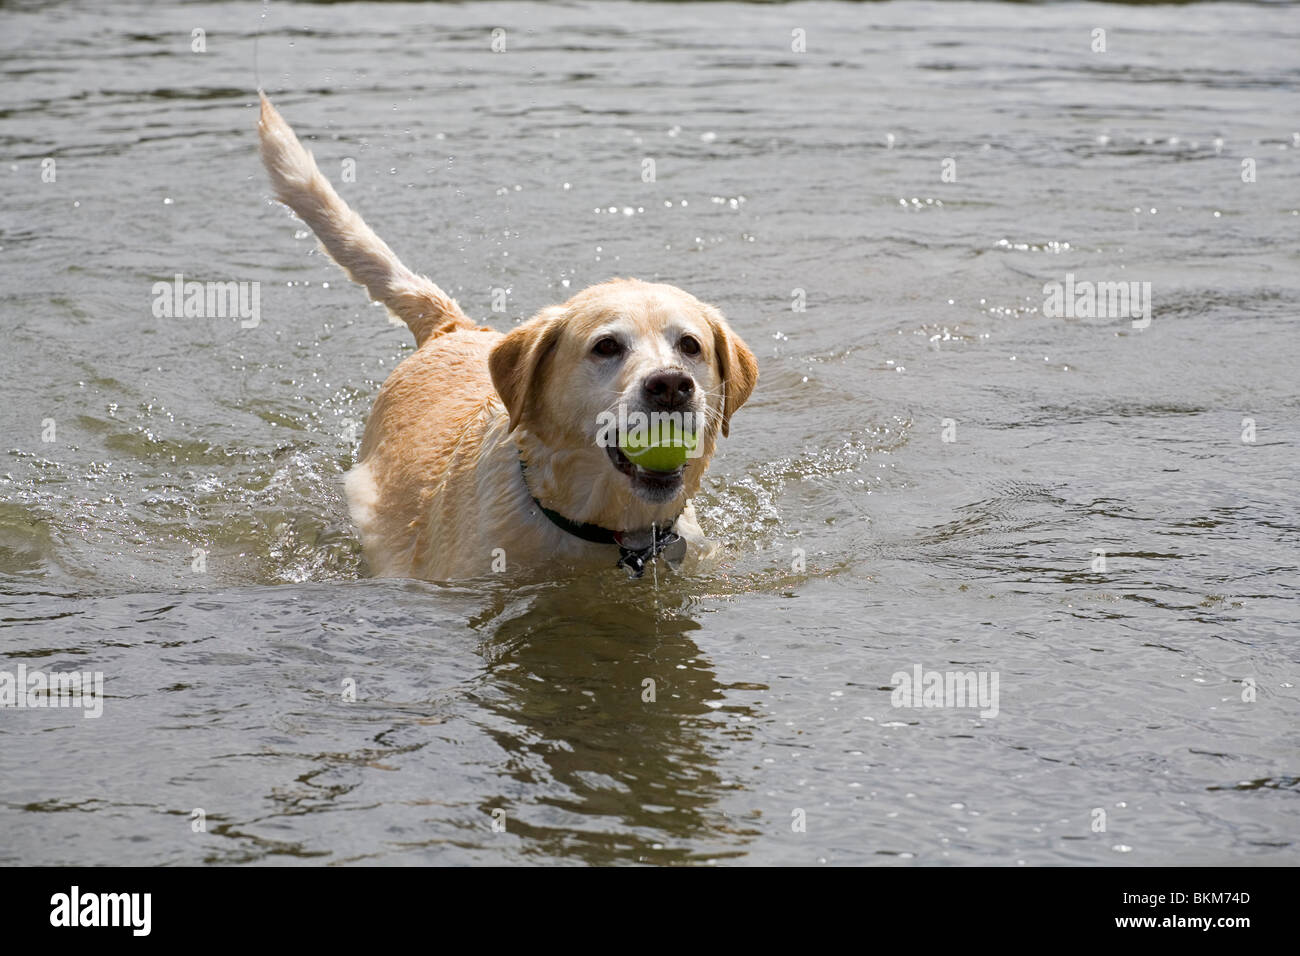 A yellow Labrador Retriever chases a tennis ball into a river to retrieve for its master - Stock Image